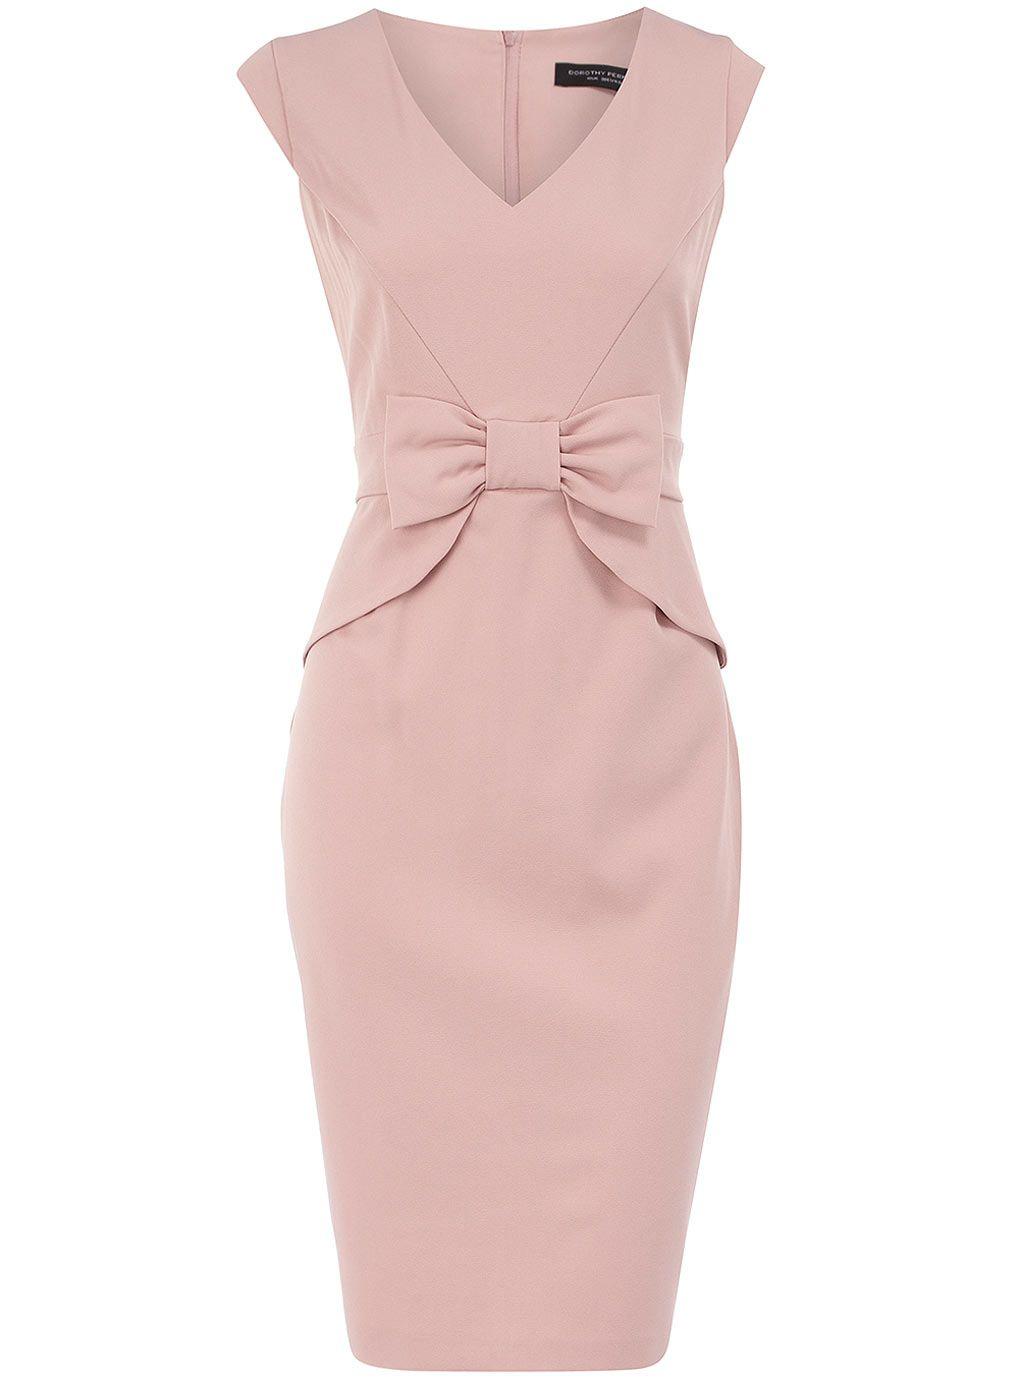 Peplum bow dress http://thepageantplanet.com/category/pageant ...